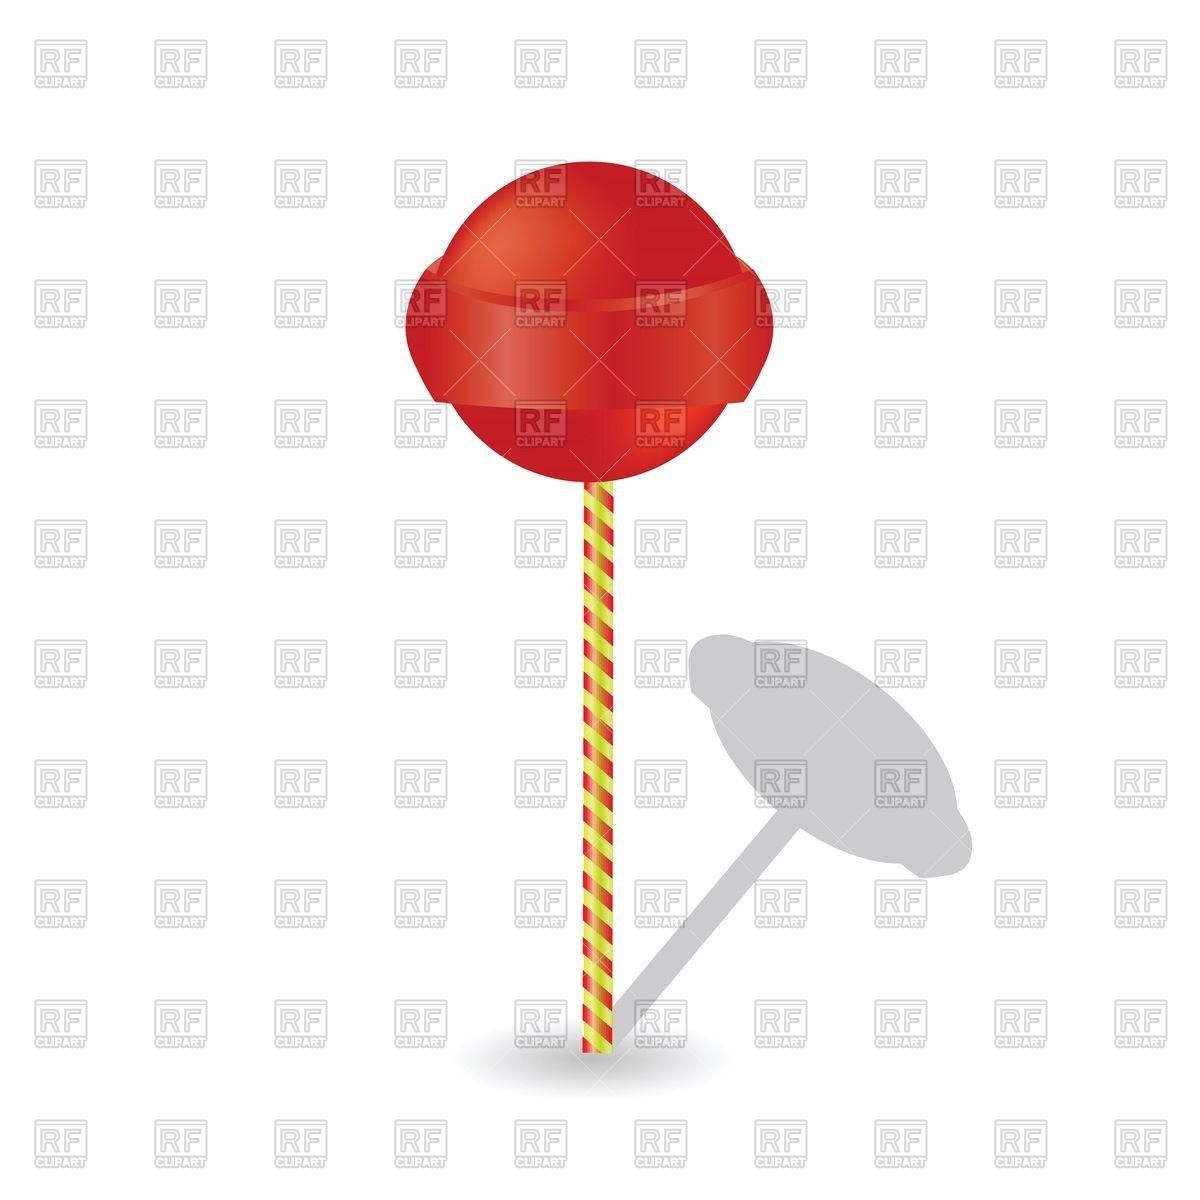 Red lollipop (Chupa Chups) Vector Image #44319.